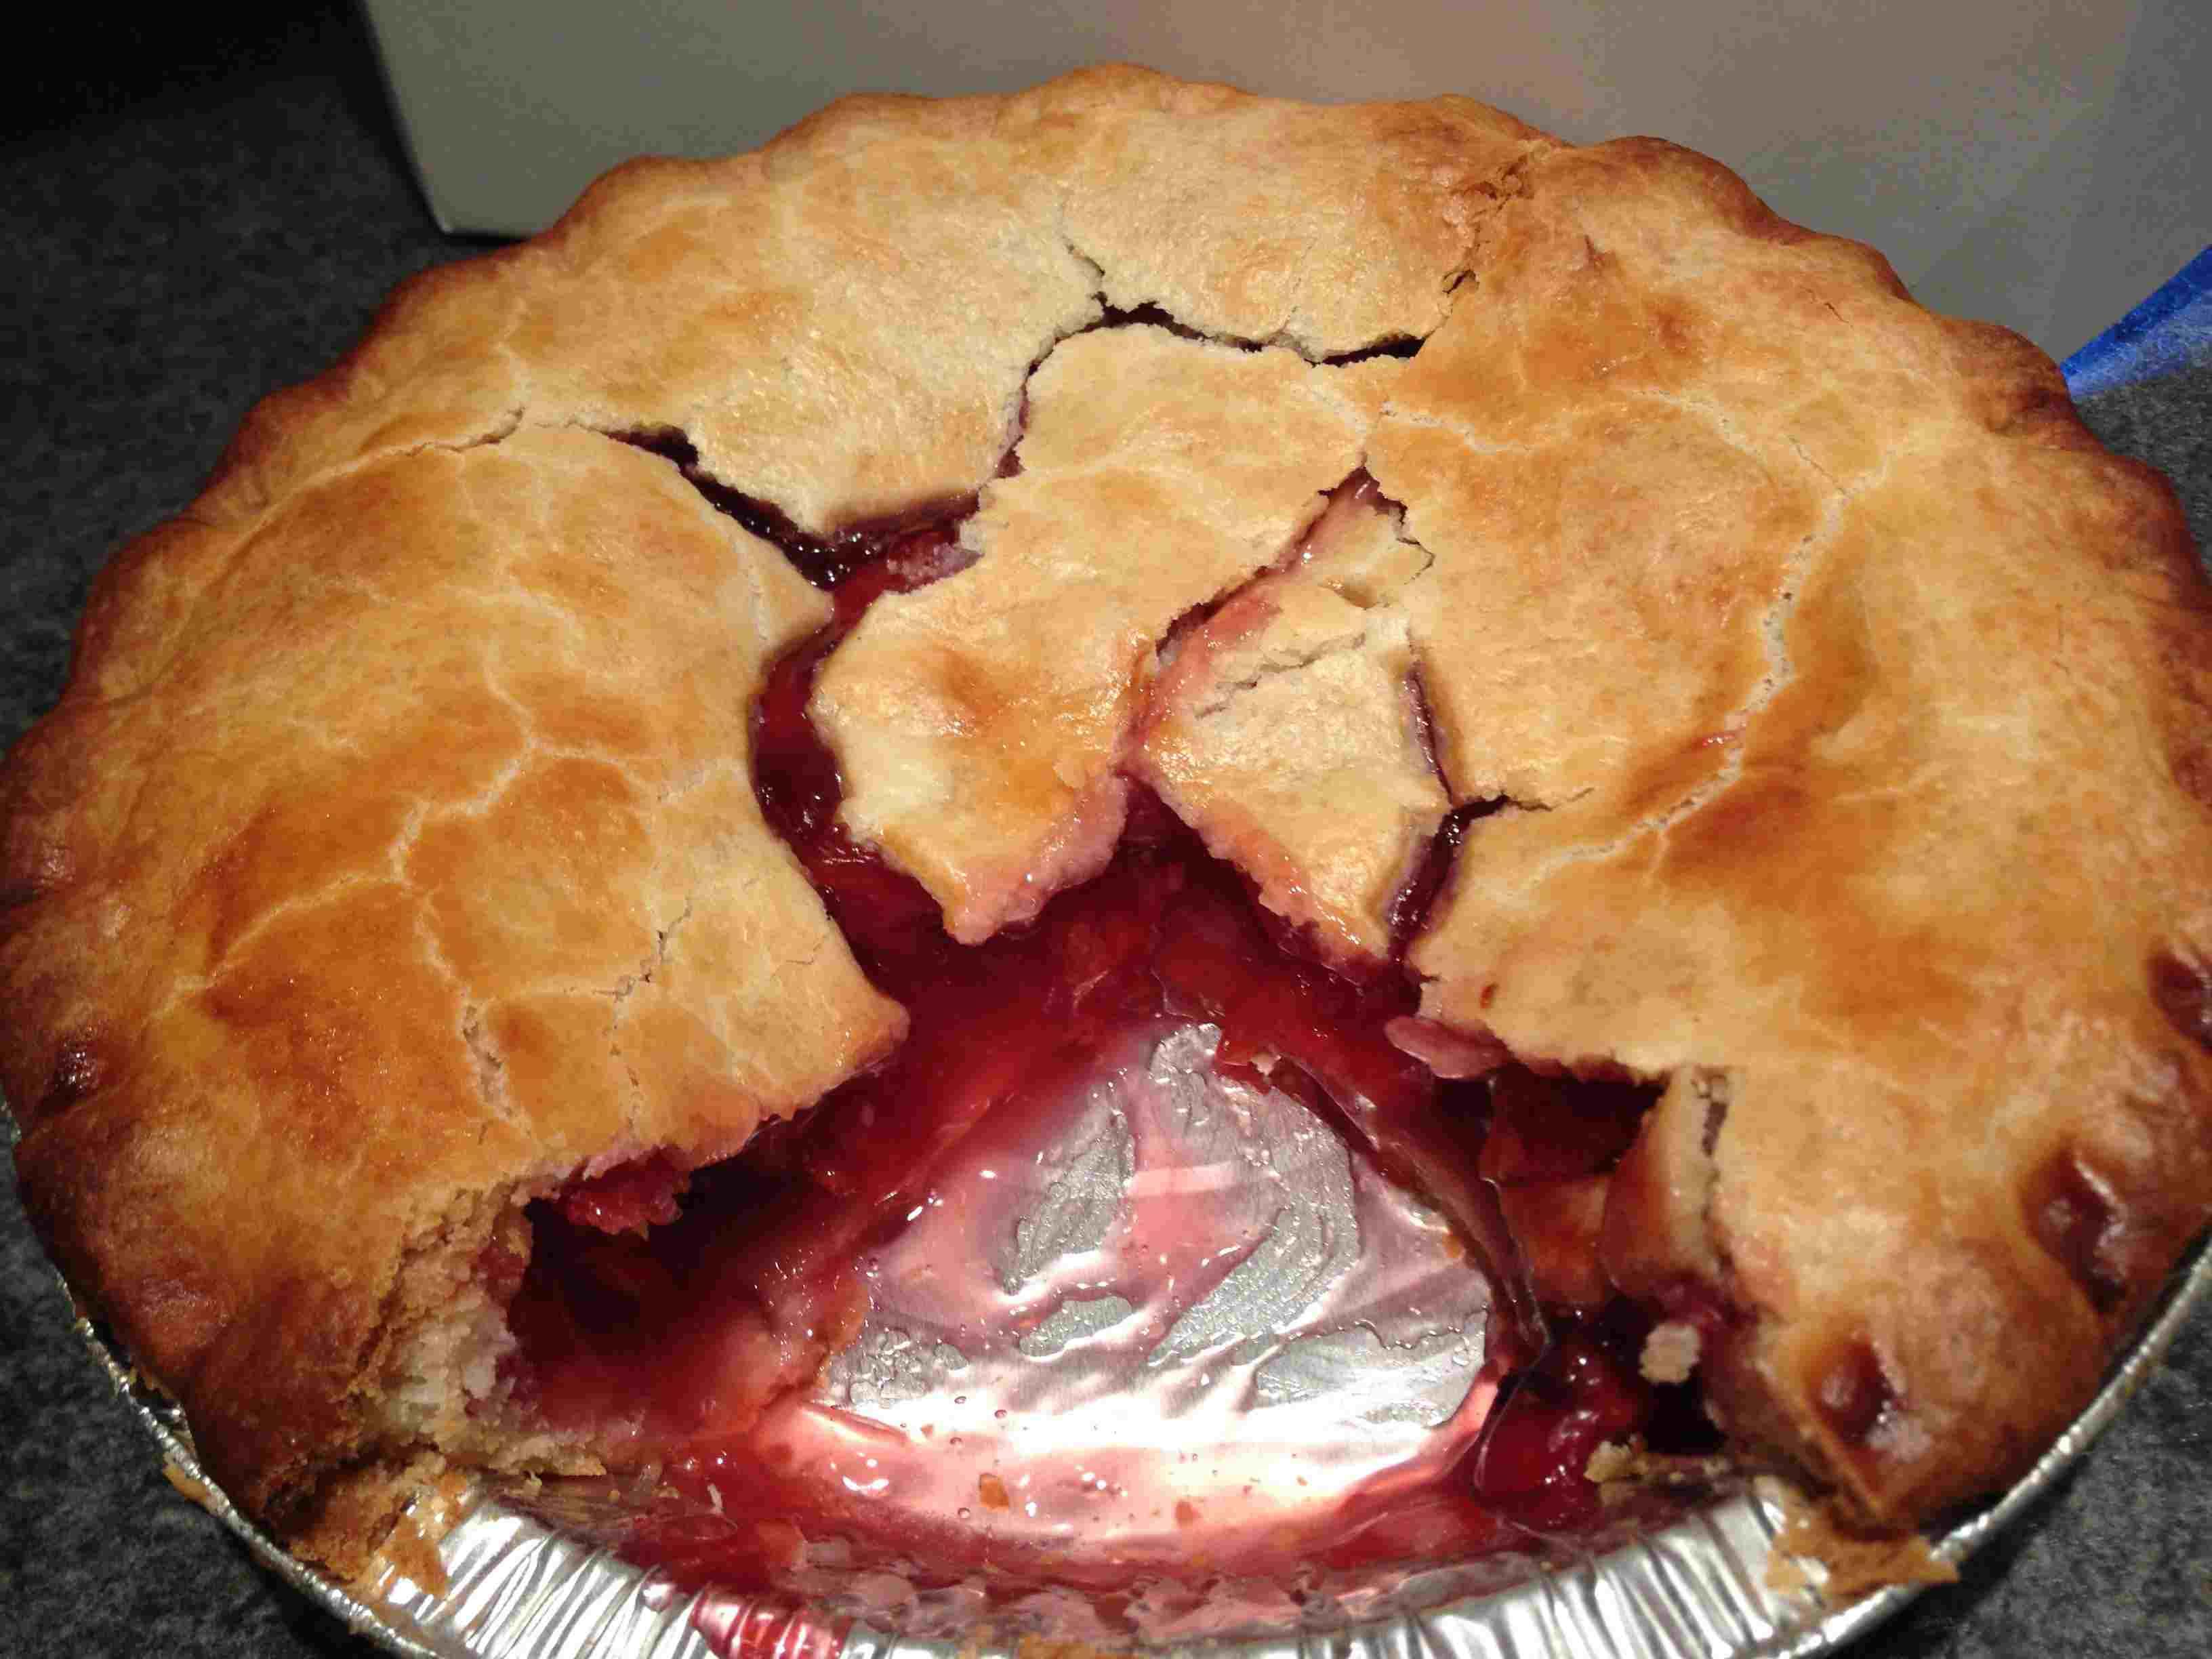 Cherry Pie from Missouri Baking Company